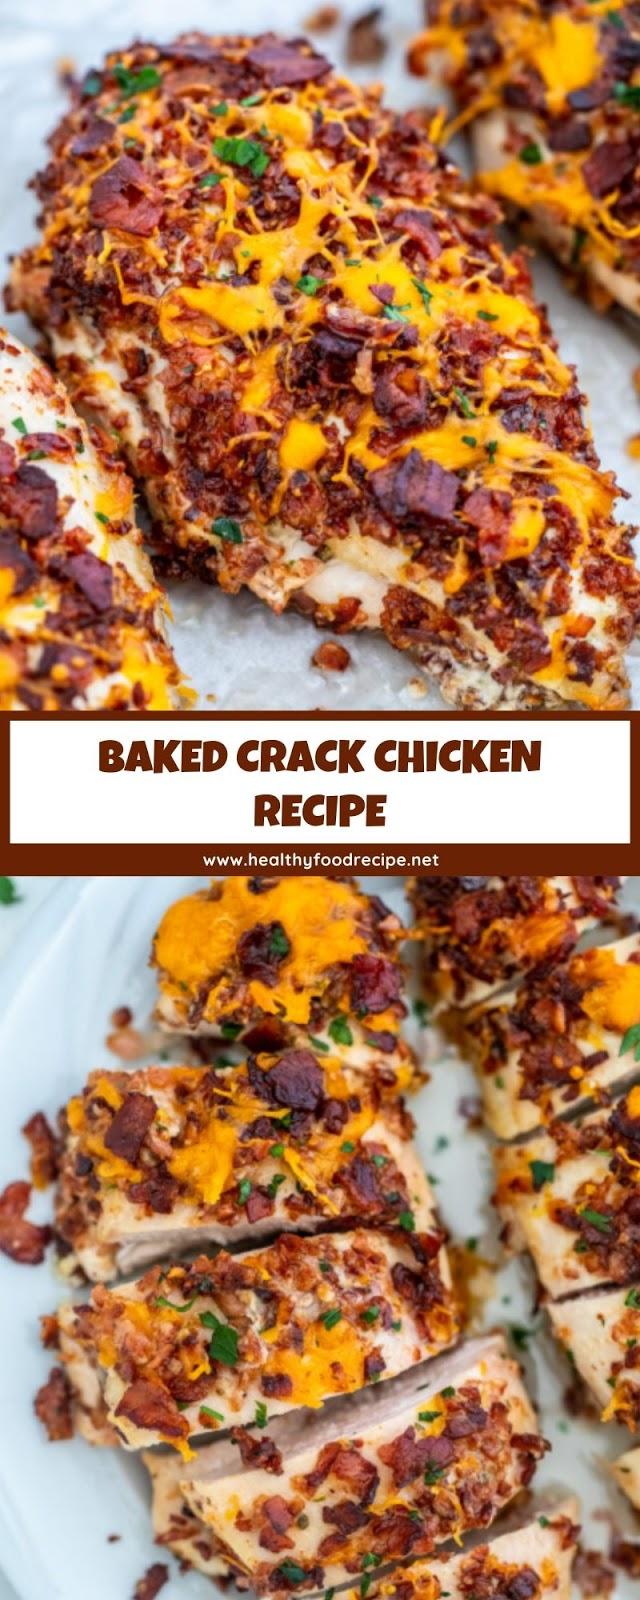 BAKED CRACK CHICKEN RECIPE